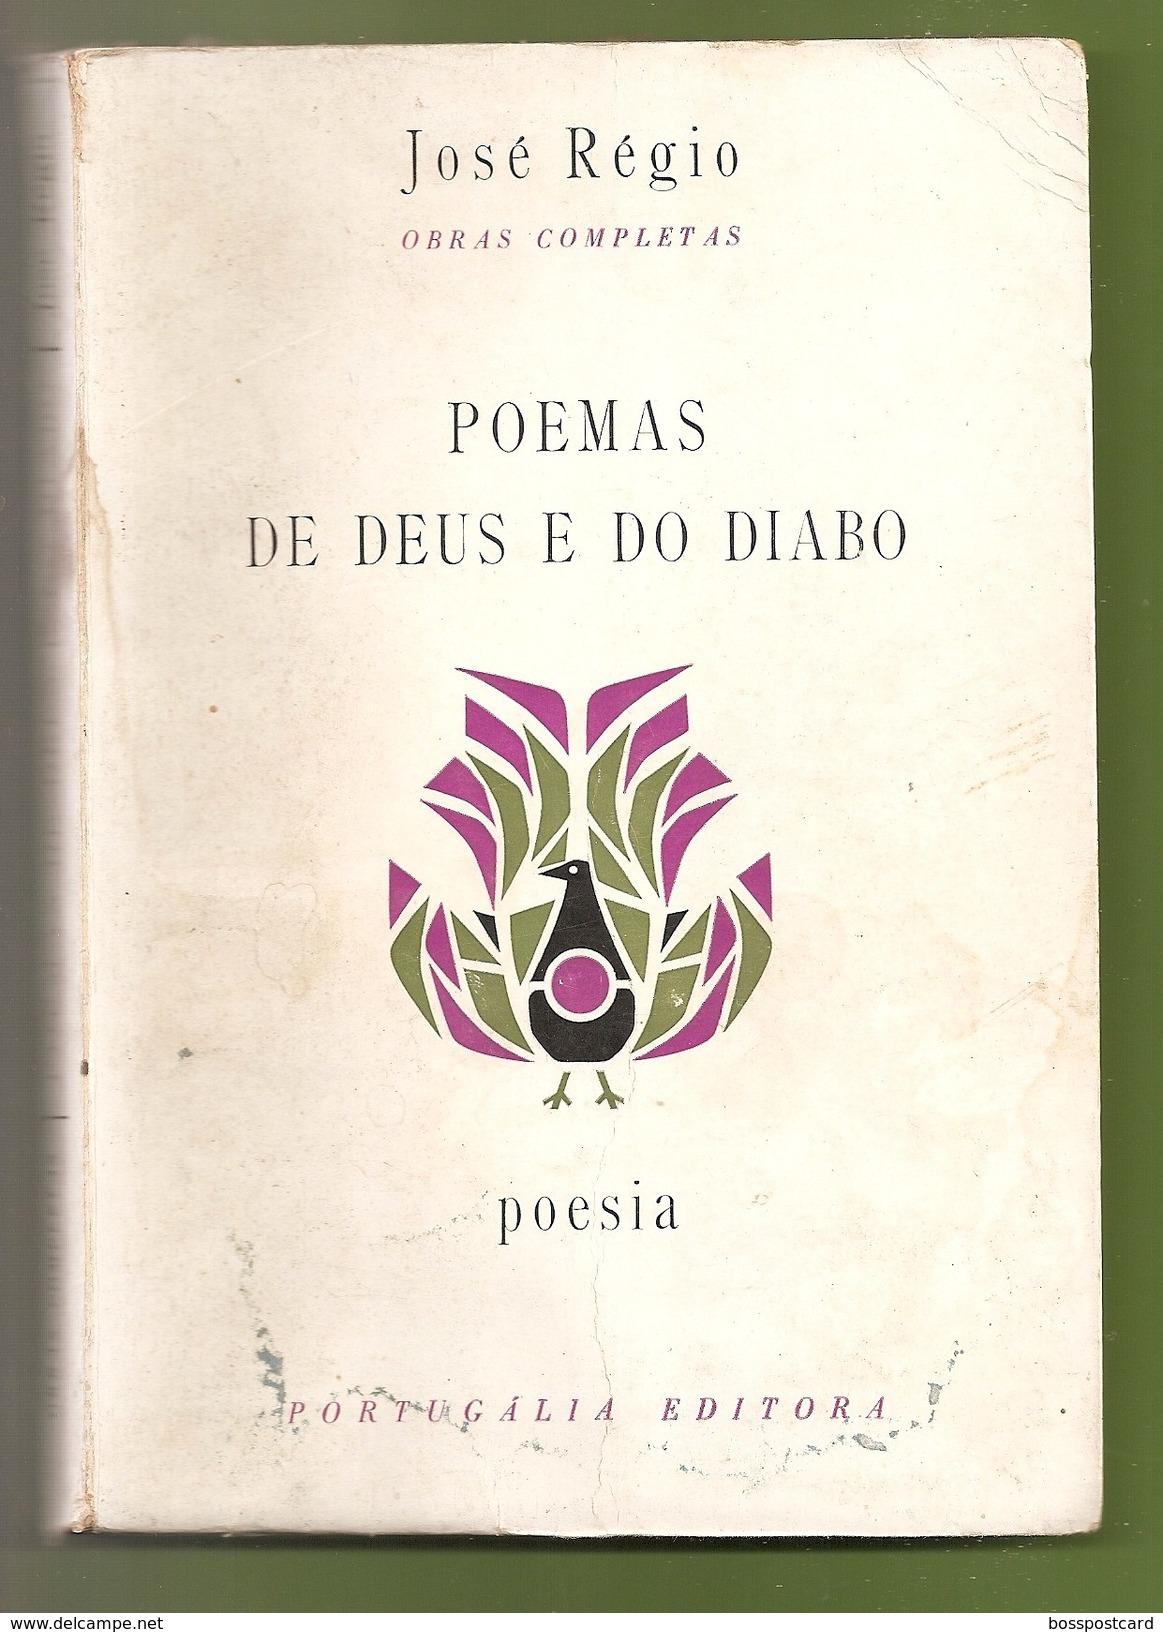 Portalegre - Poemas De Deus E Do Diabo - José Régio - Lisboa - Portugal - Poetry